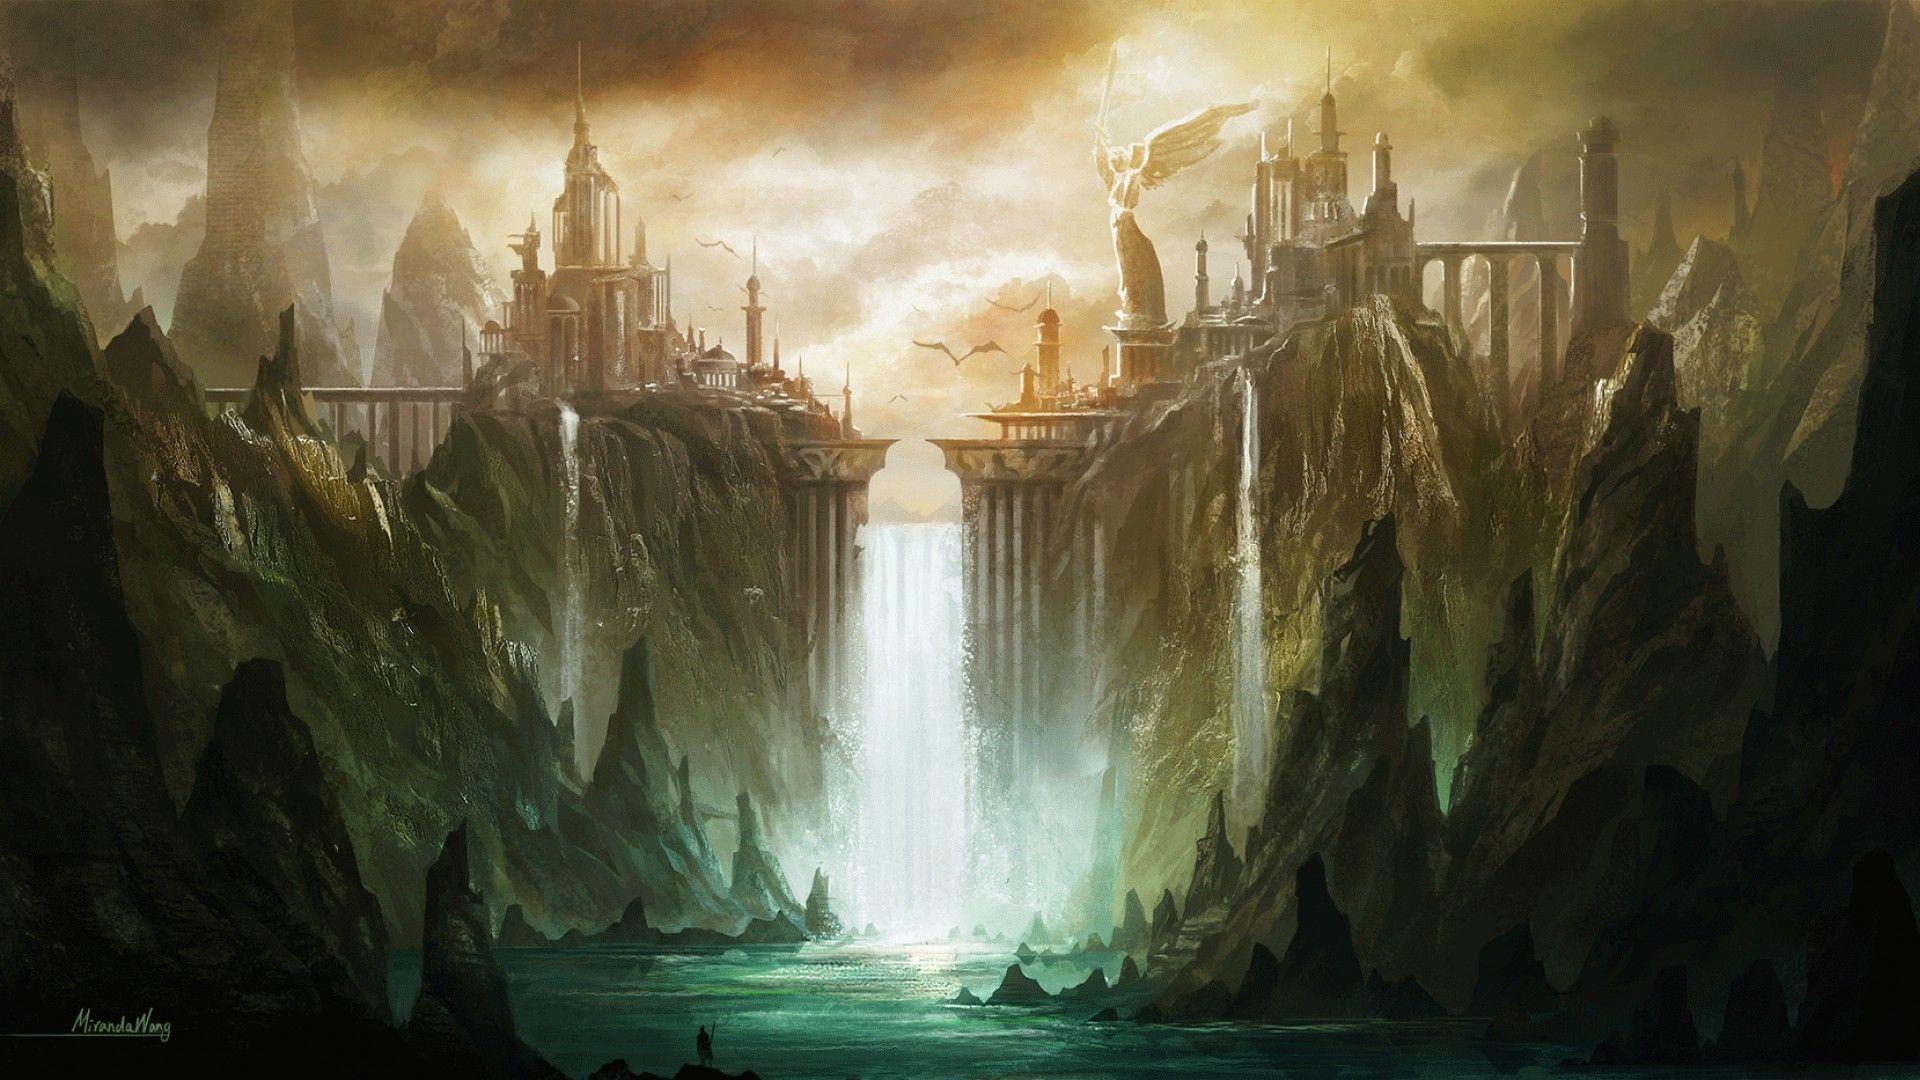 fantasy art landscapes hd background wallpaper 50 hd wallpapers